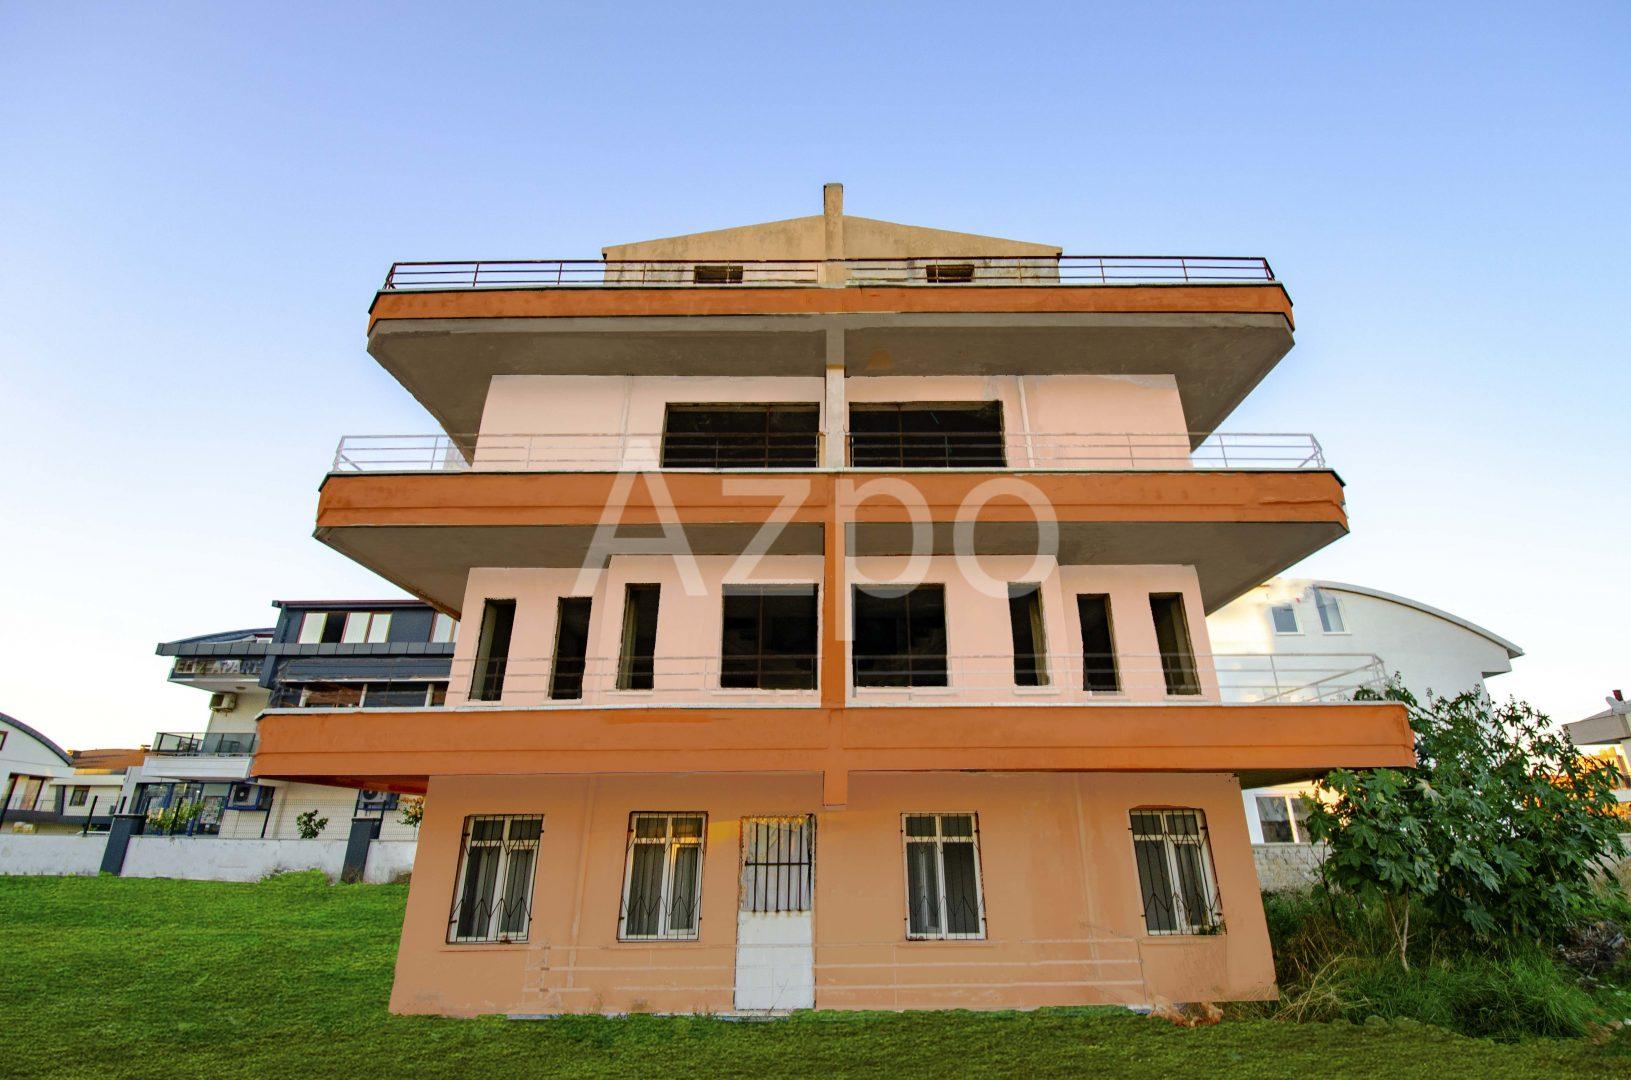 Продажа здания в районе Кунду Анталья - Фото 1